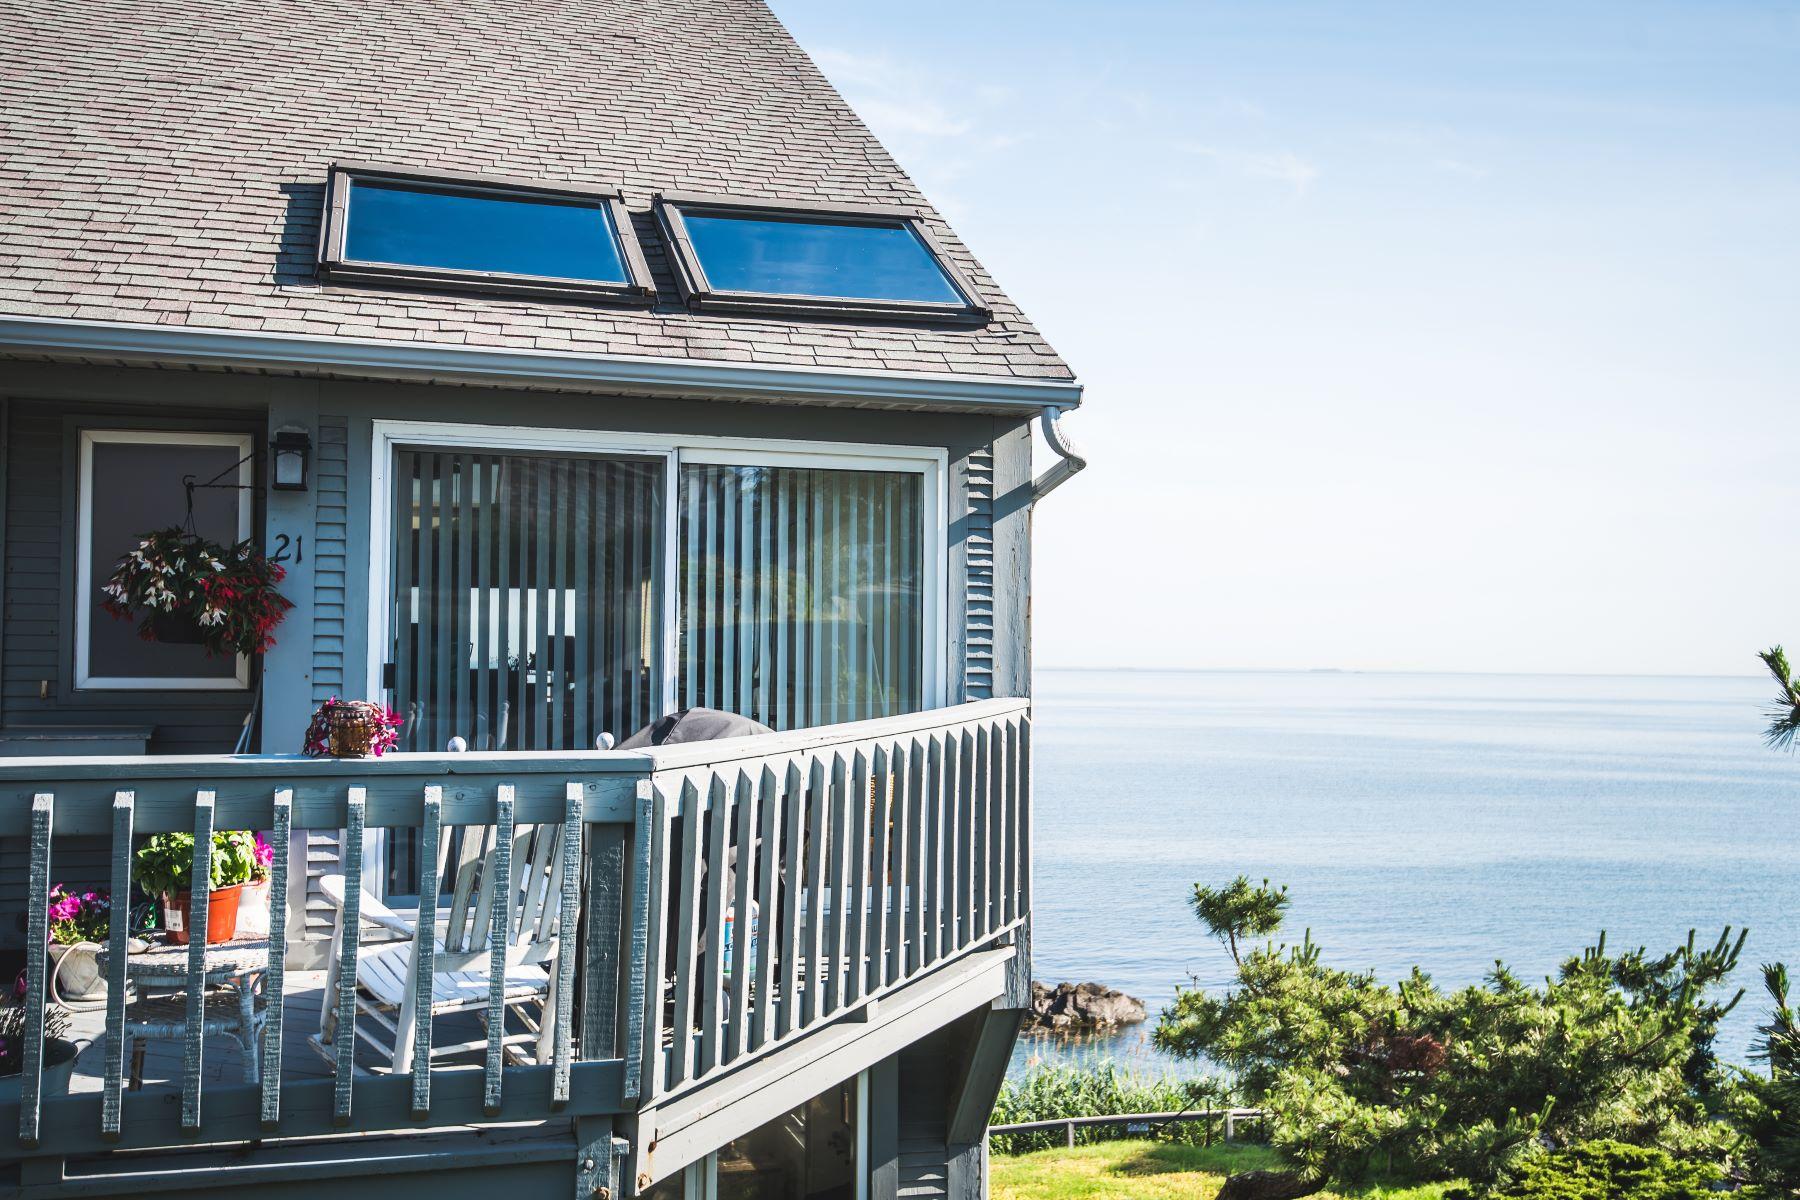 Condominiums 为 销售 在 21 Oceanside Drive, Unit 21 赫尔, 马萨诸塞州 02045 美国